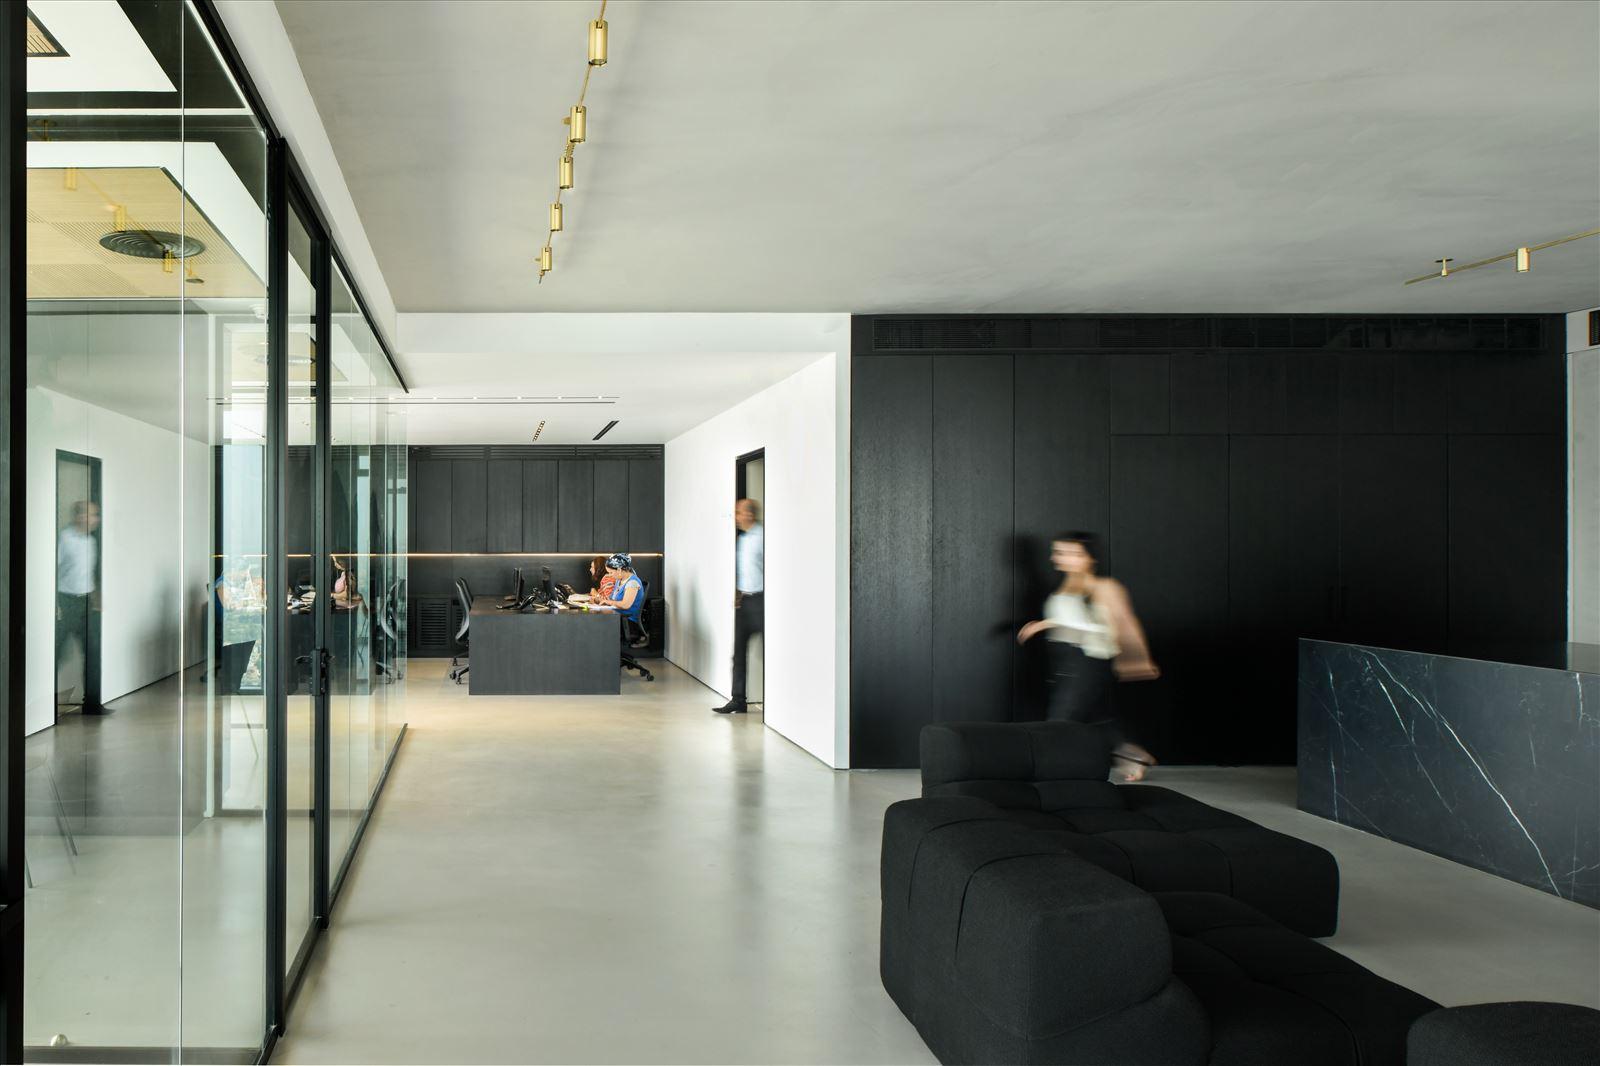 Divident office מגוון גופי תאורה לאורך מסדרונות המשרד בתכנון קמחי תאורה